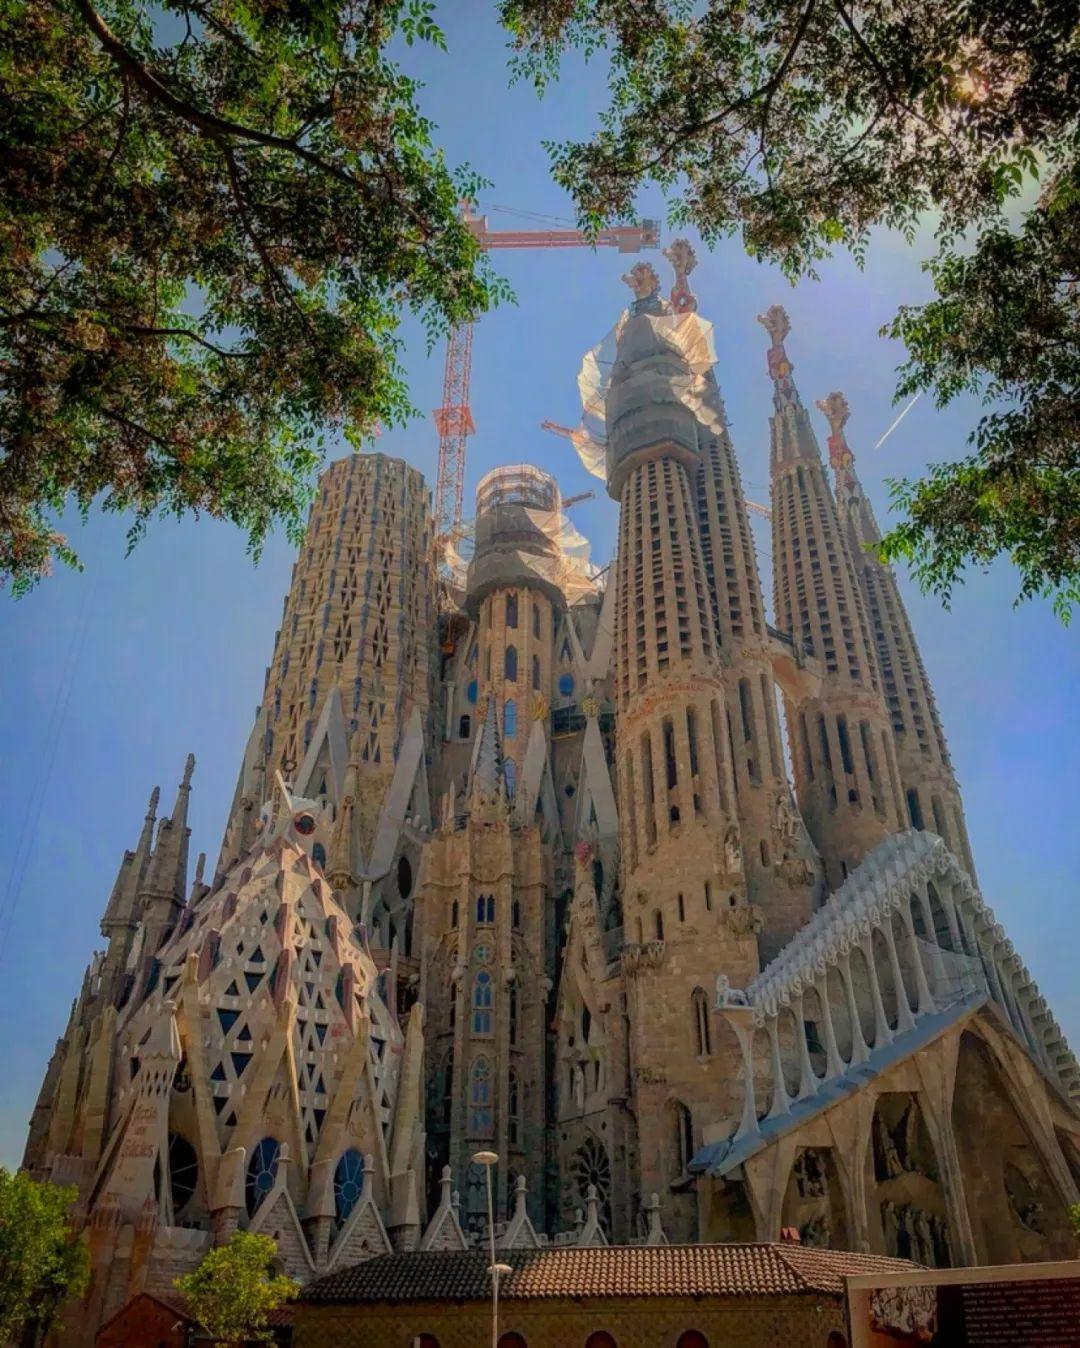 Travel&Leisure评选欧洲15个最佳城市,有你喜欢的城市上榜吗?